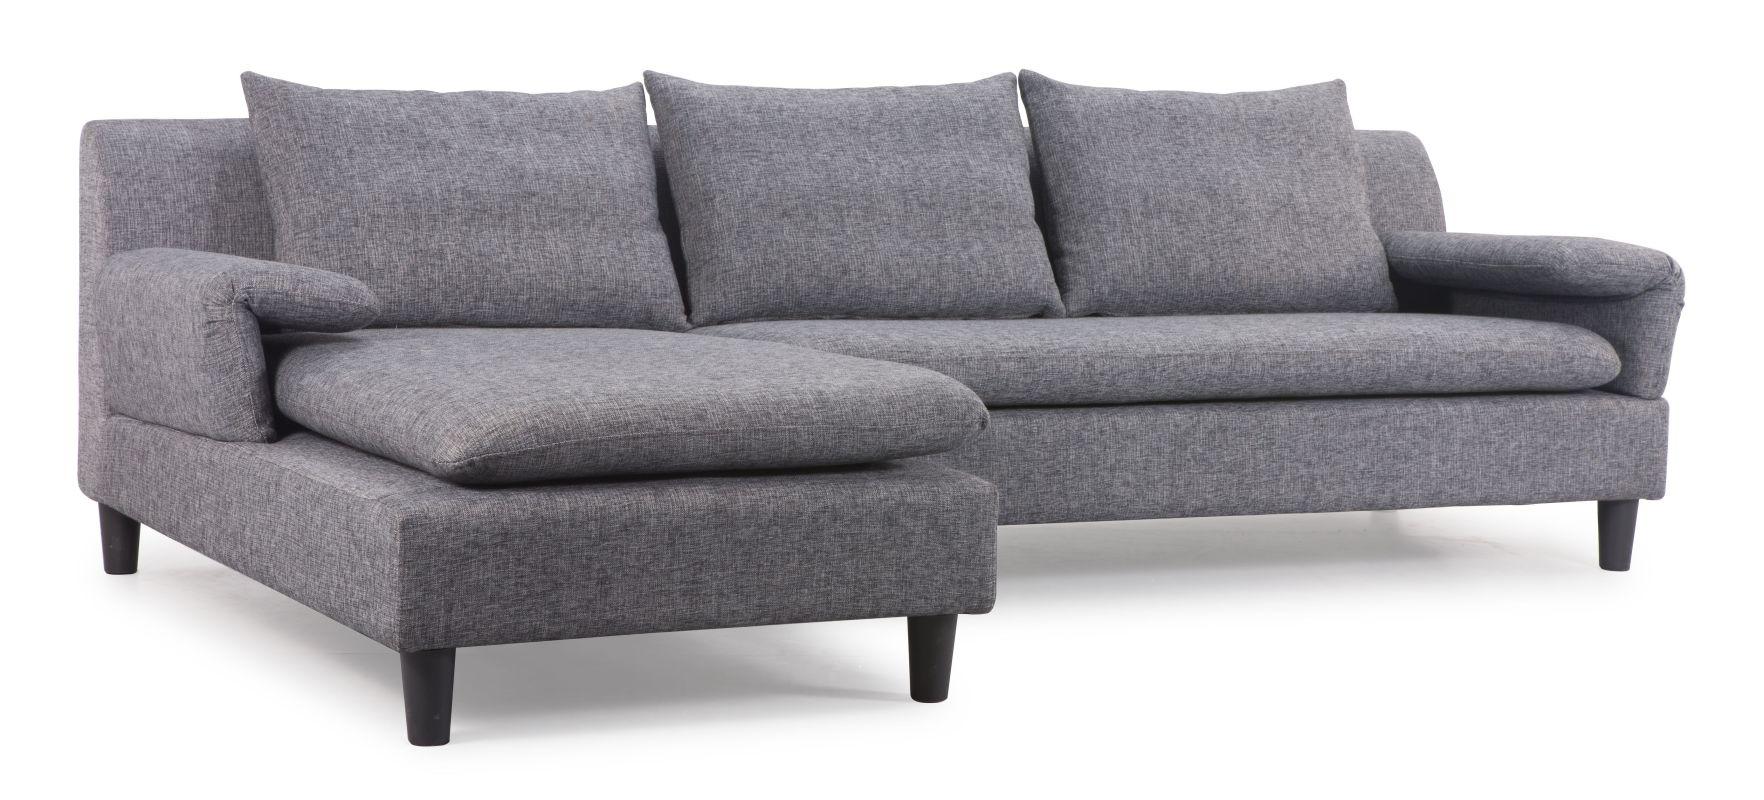 Zuo Modern Axiom Sectional Axiom Sectional Ash Gray Furniture Sofas